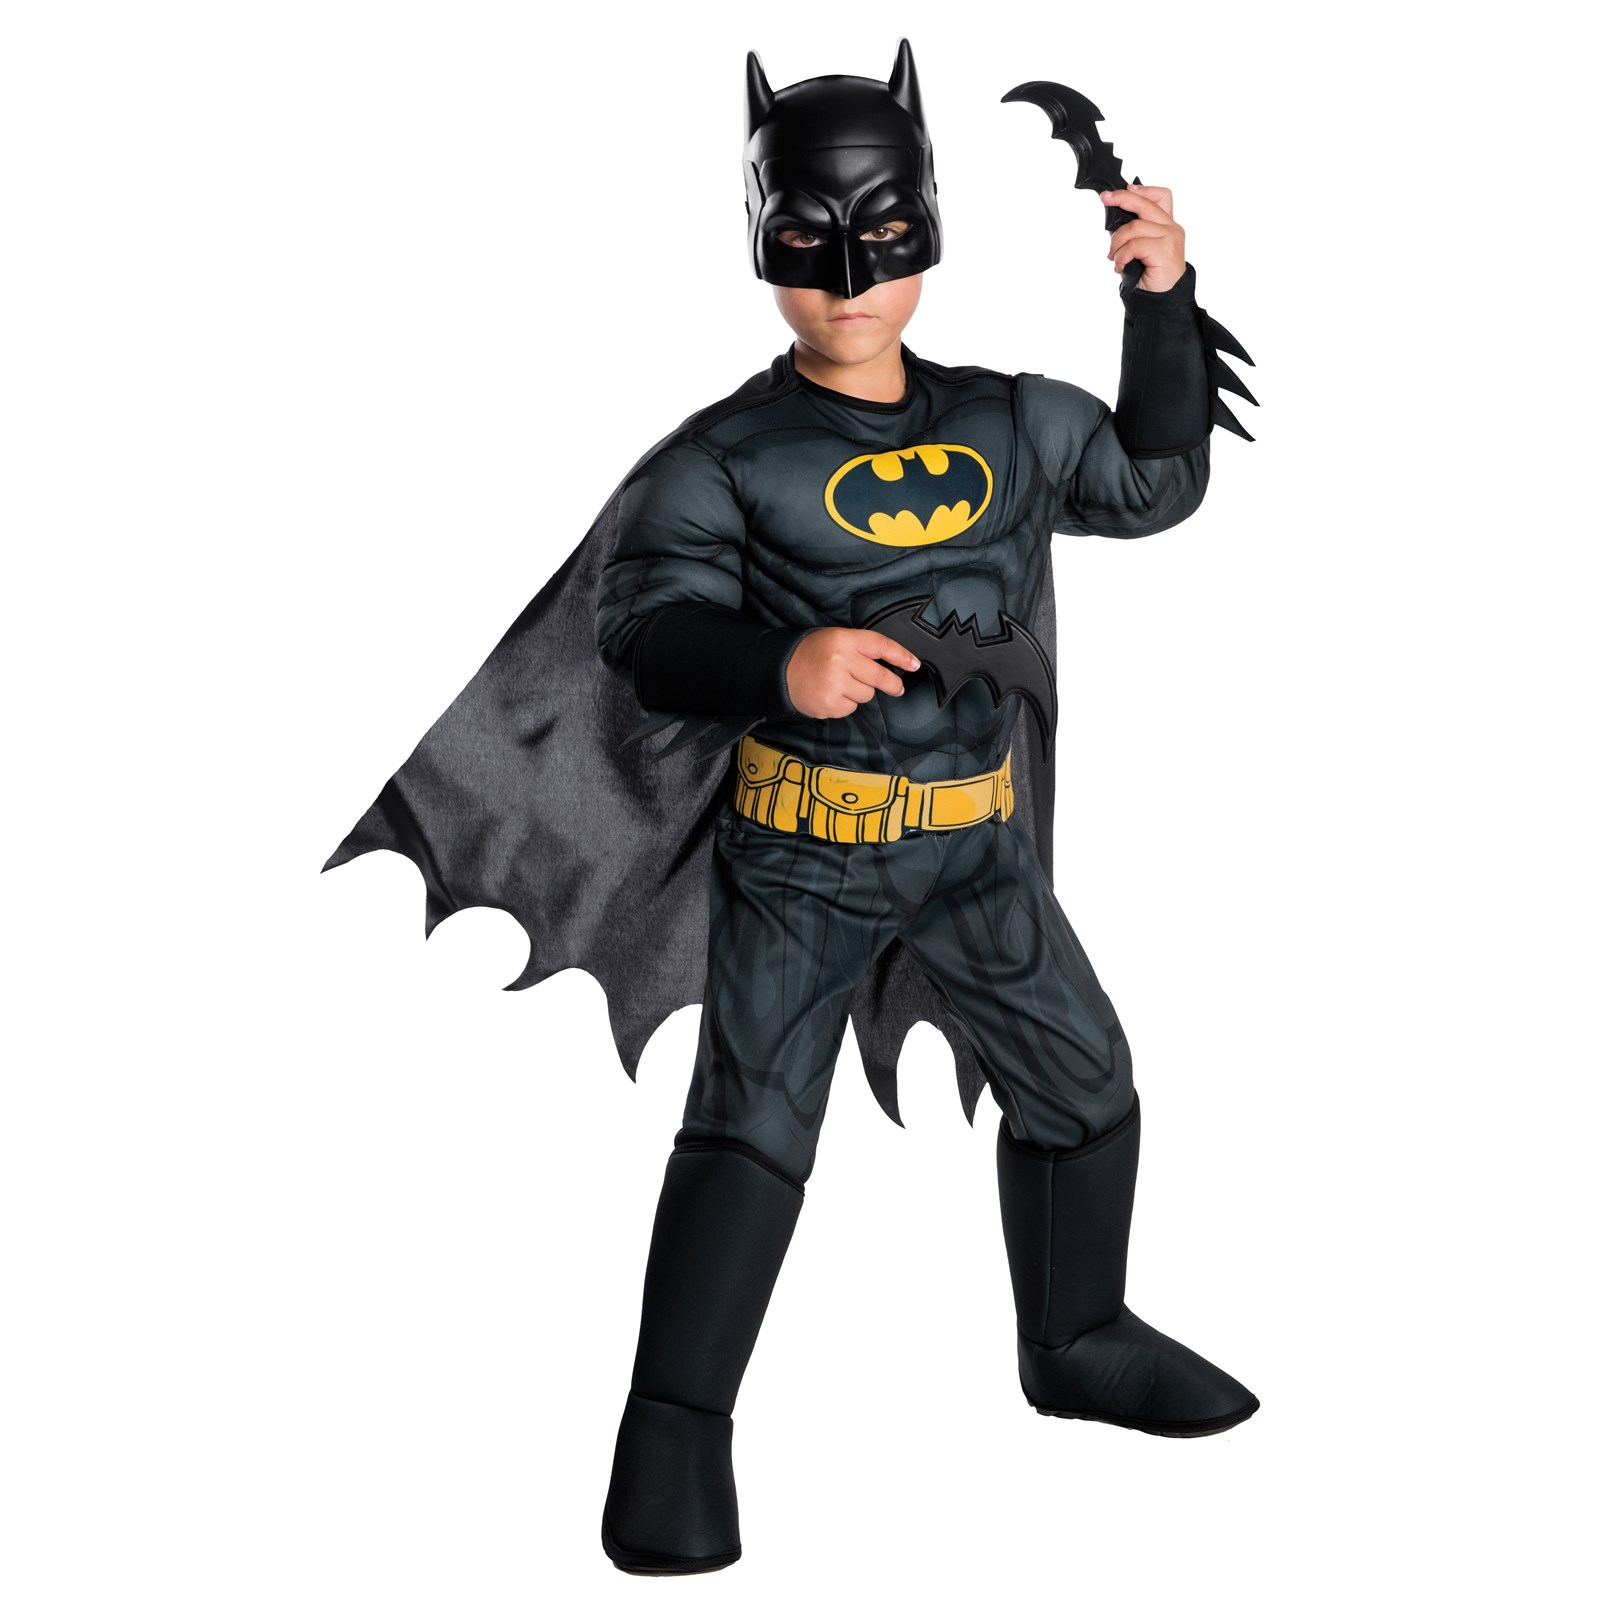 Batman Deluxe Child Costume